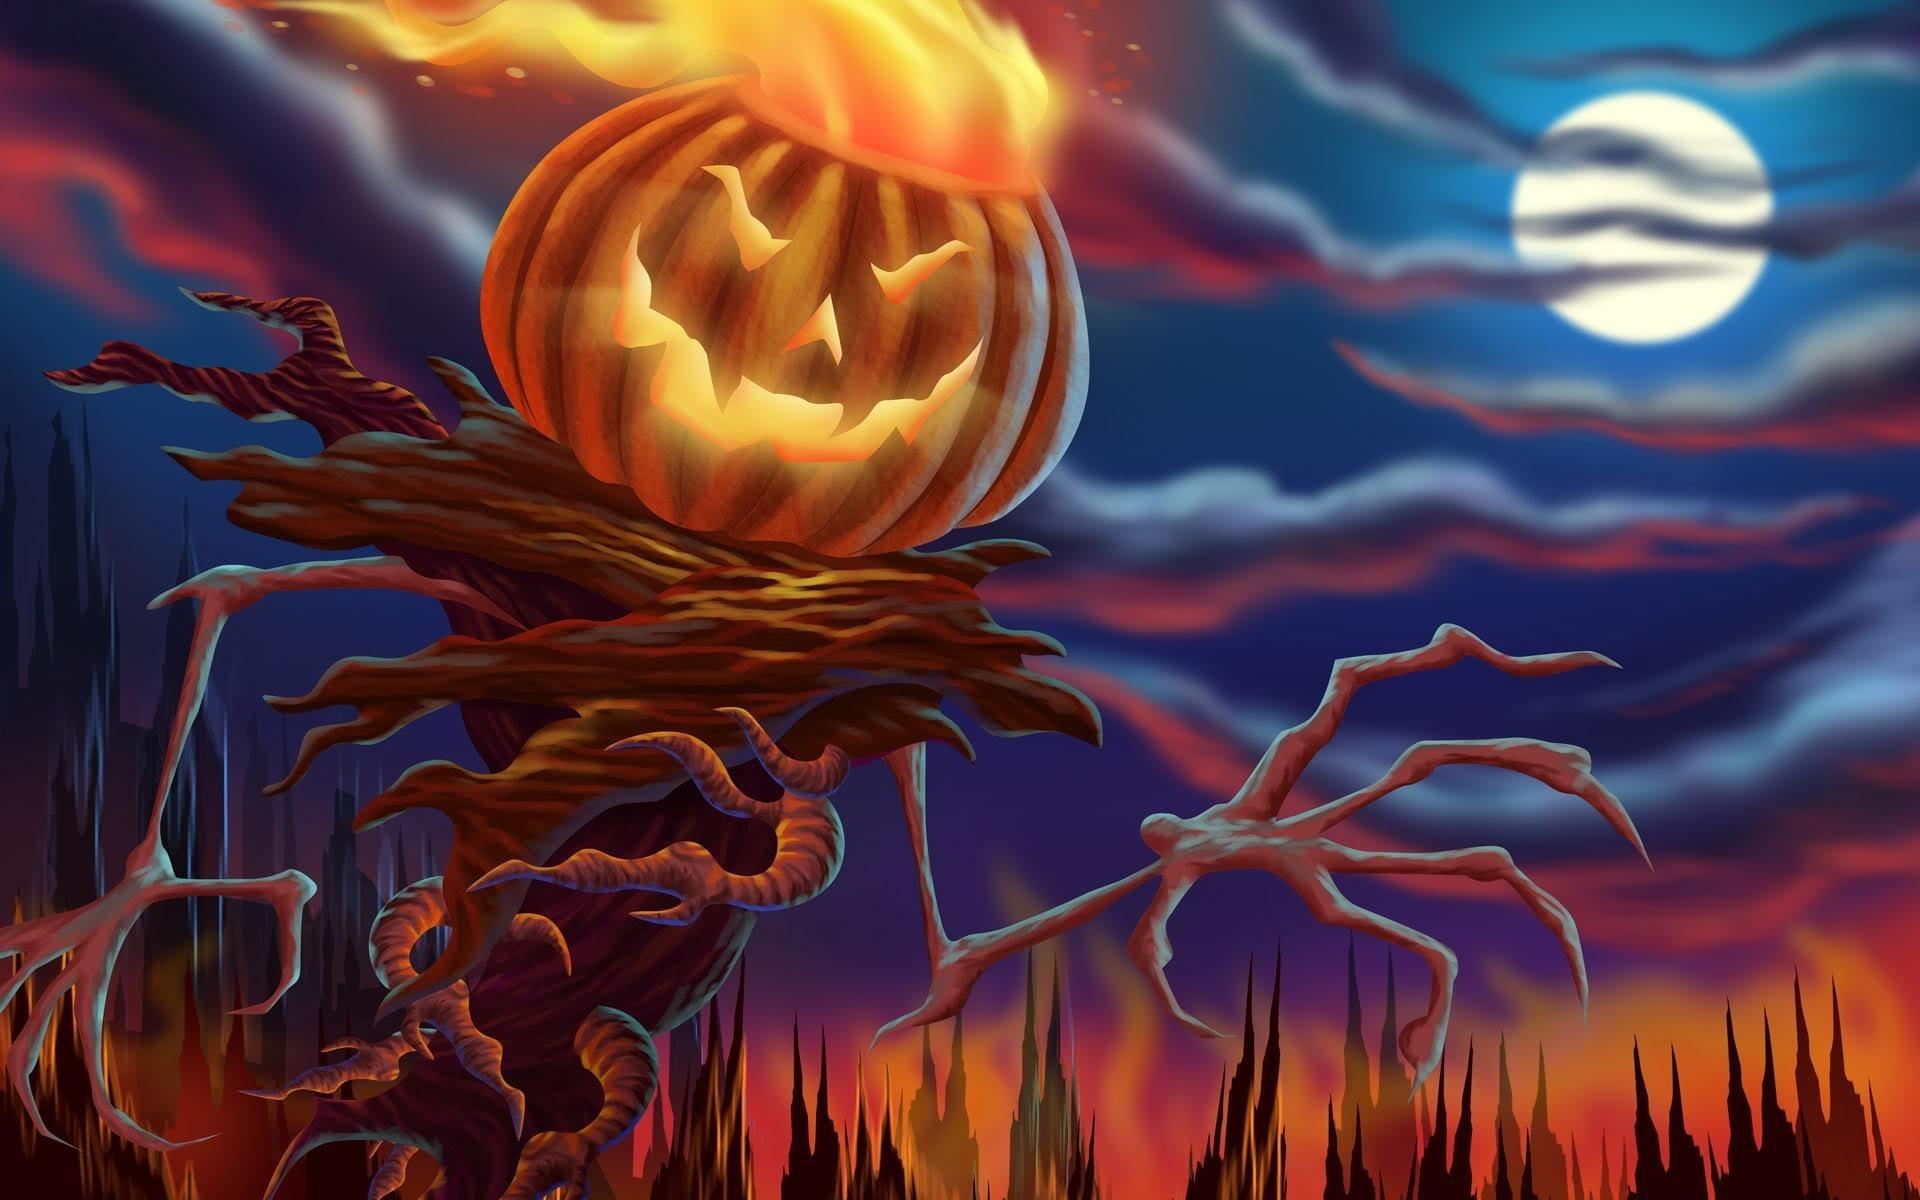 Halloween scarecrow - Halloween Scarecrow Wallpaper